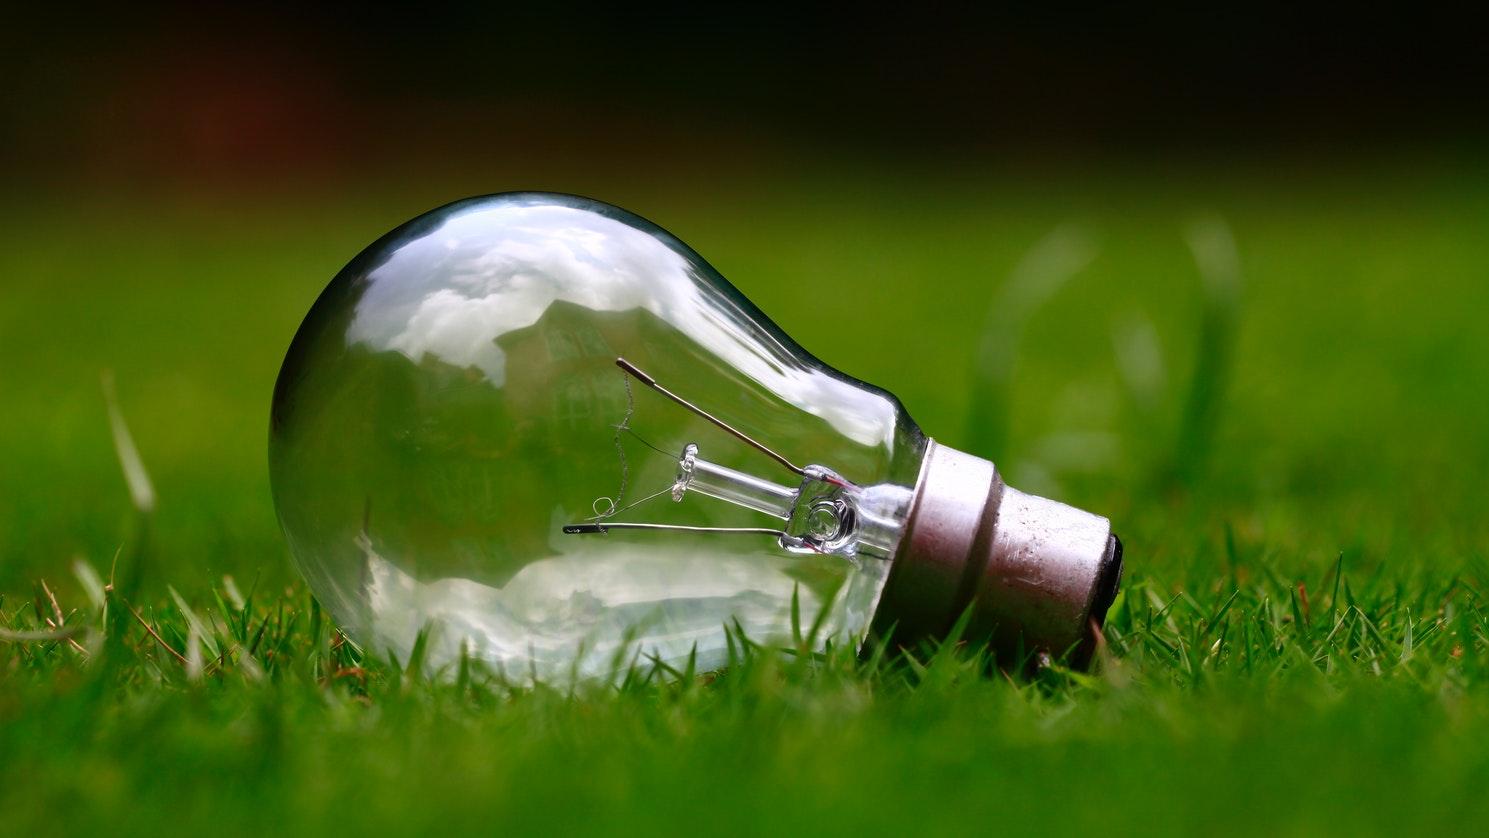 A lightbulb sitting in grass.